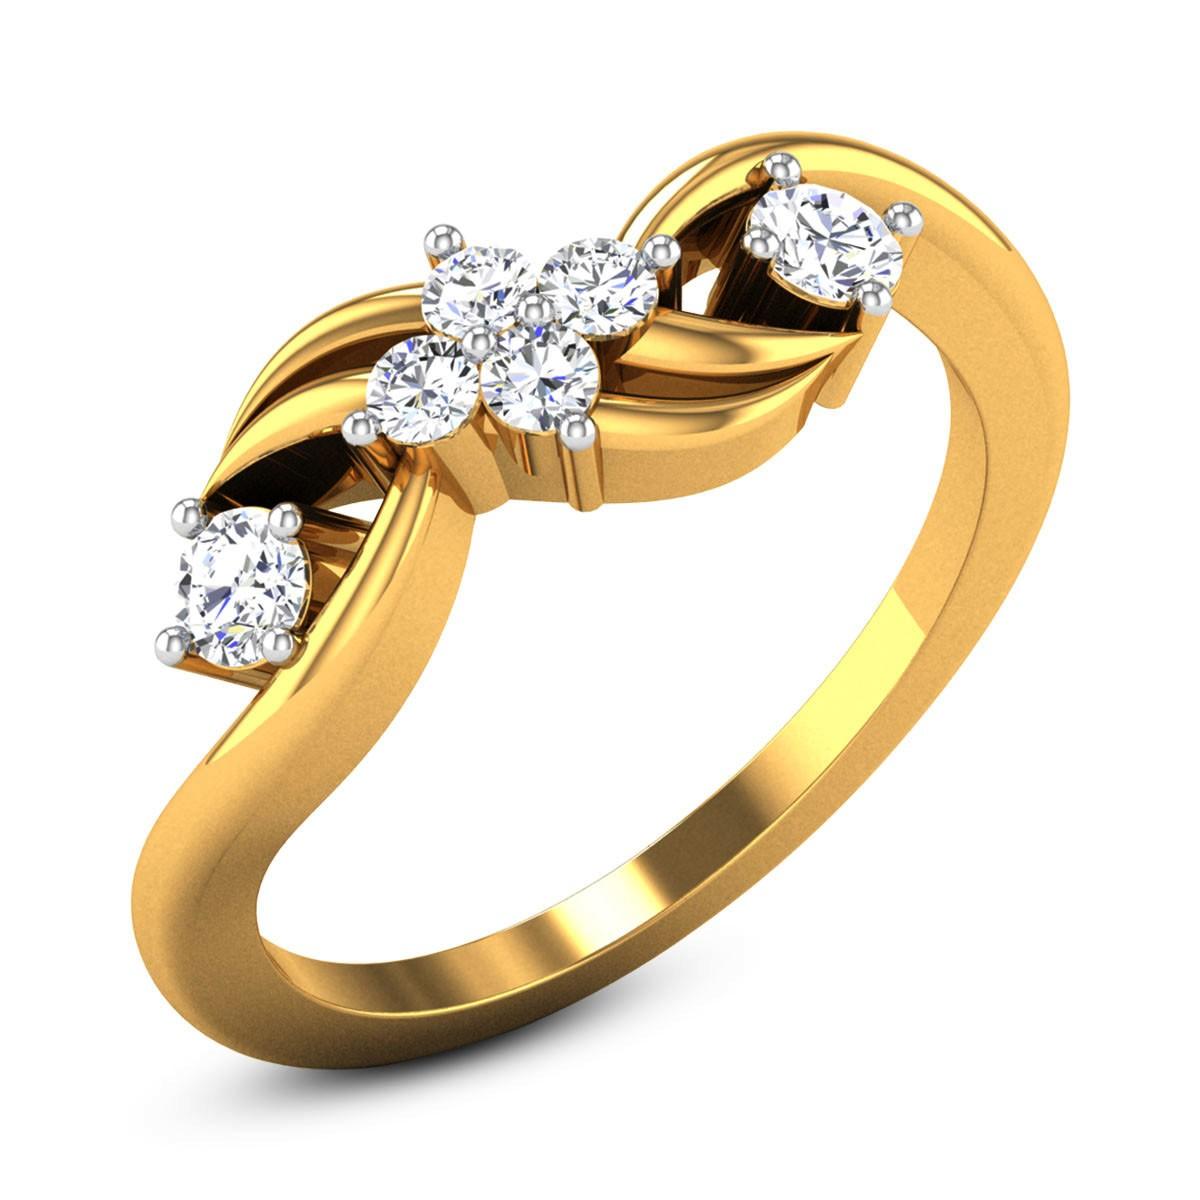 Sigmund Diamond Floral Ring